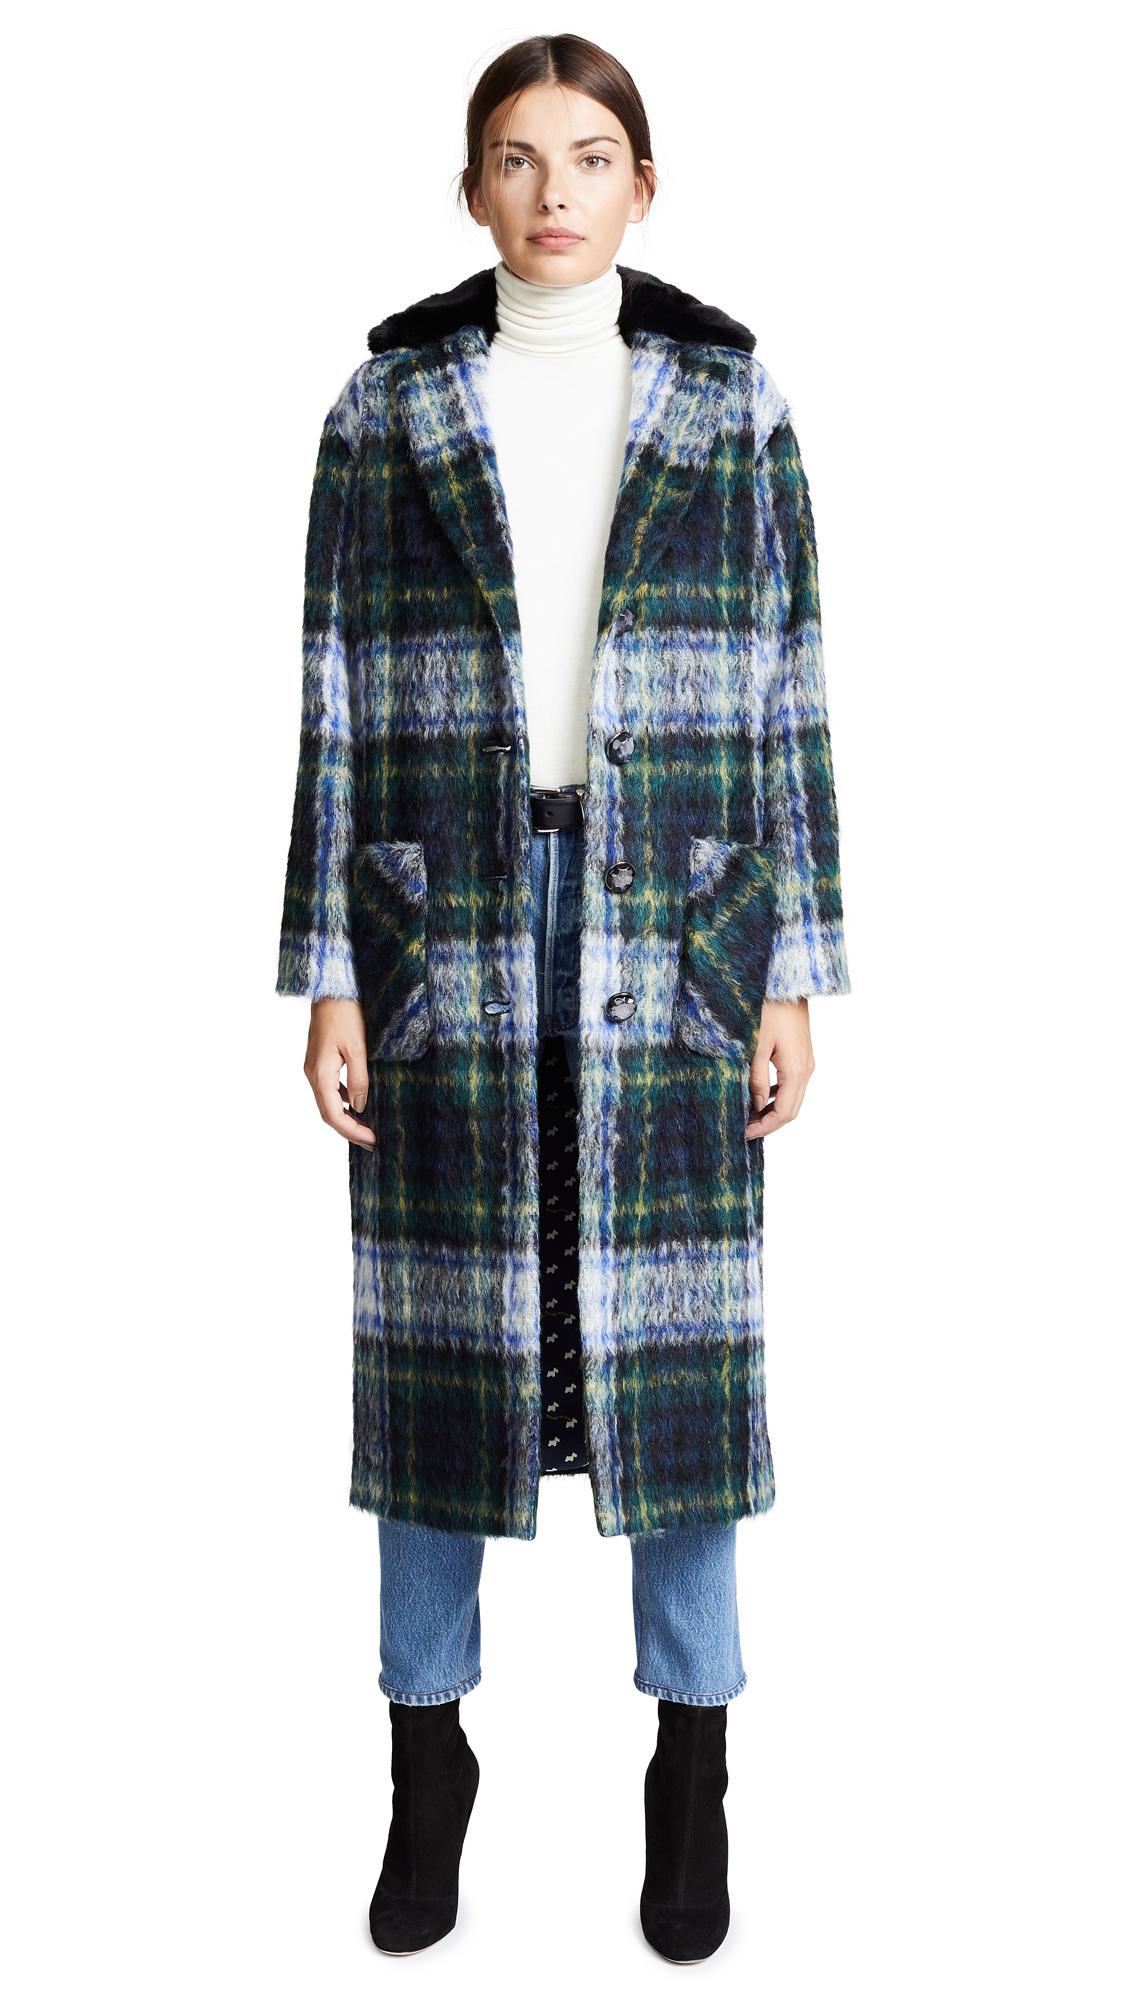 Boutique Moschino Plaid Coat